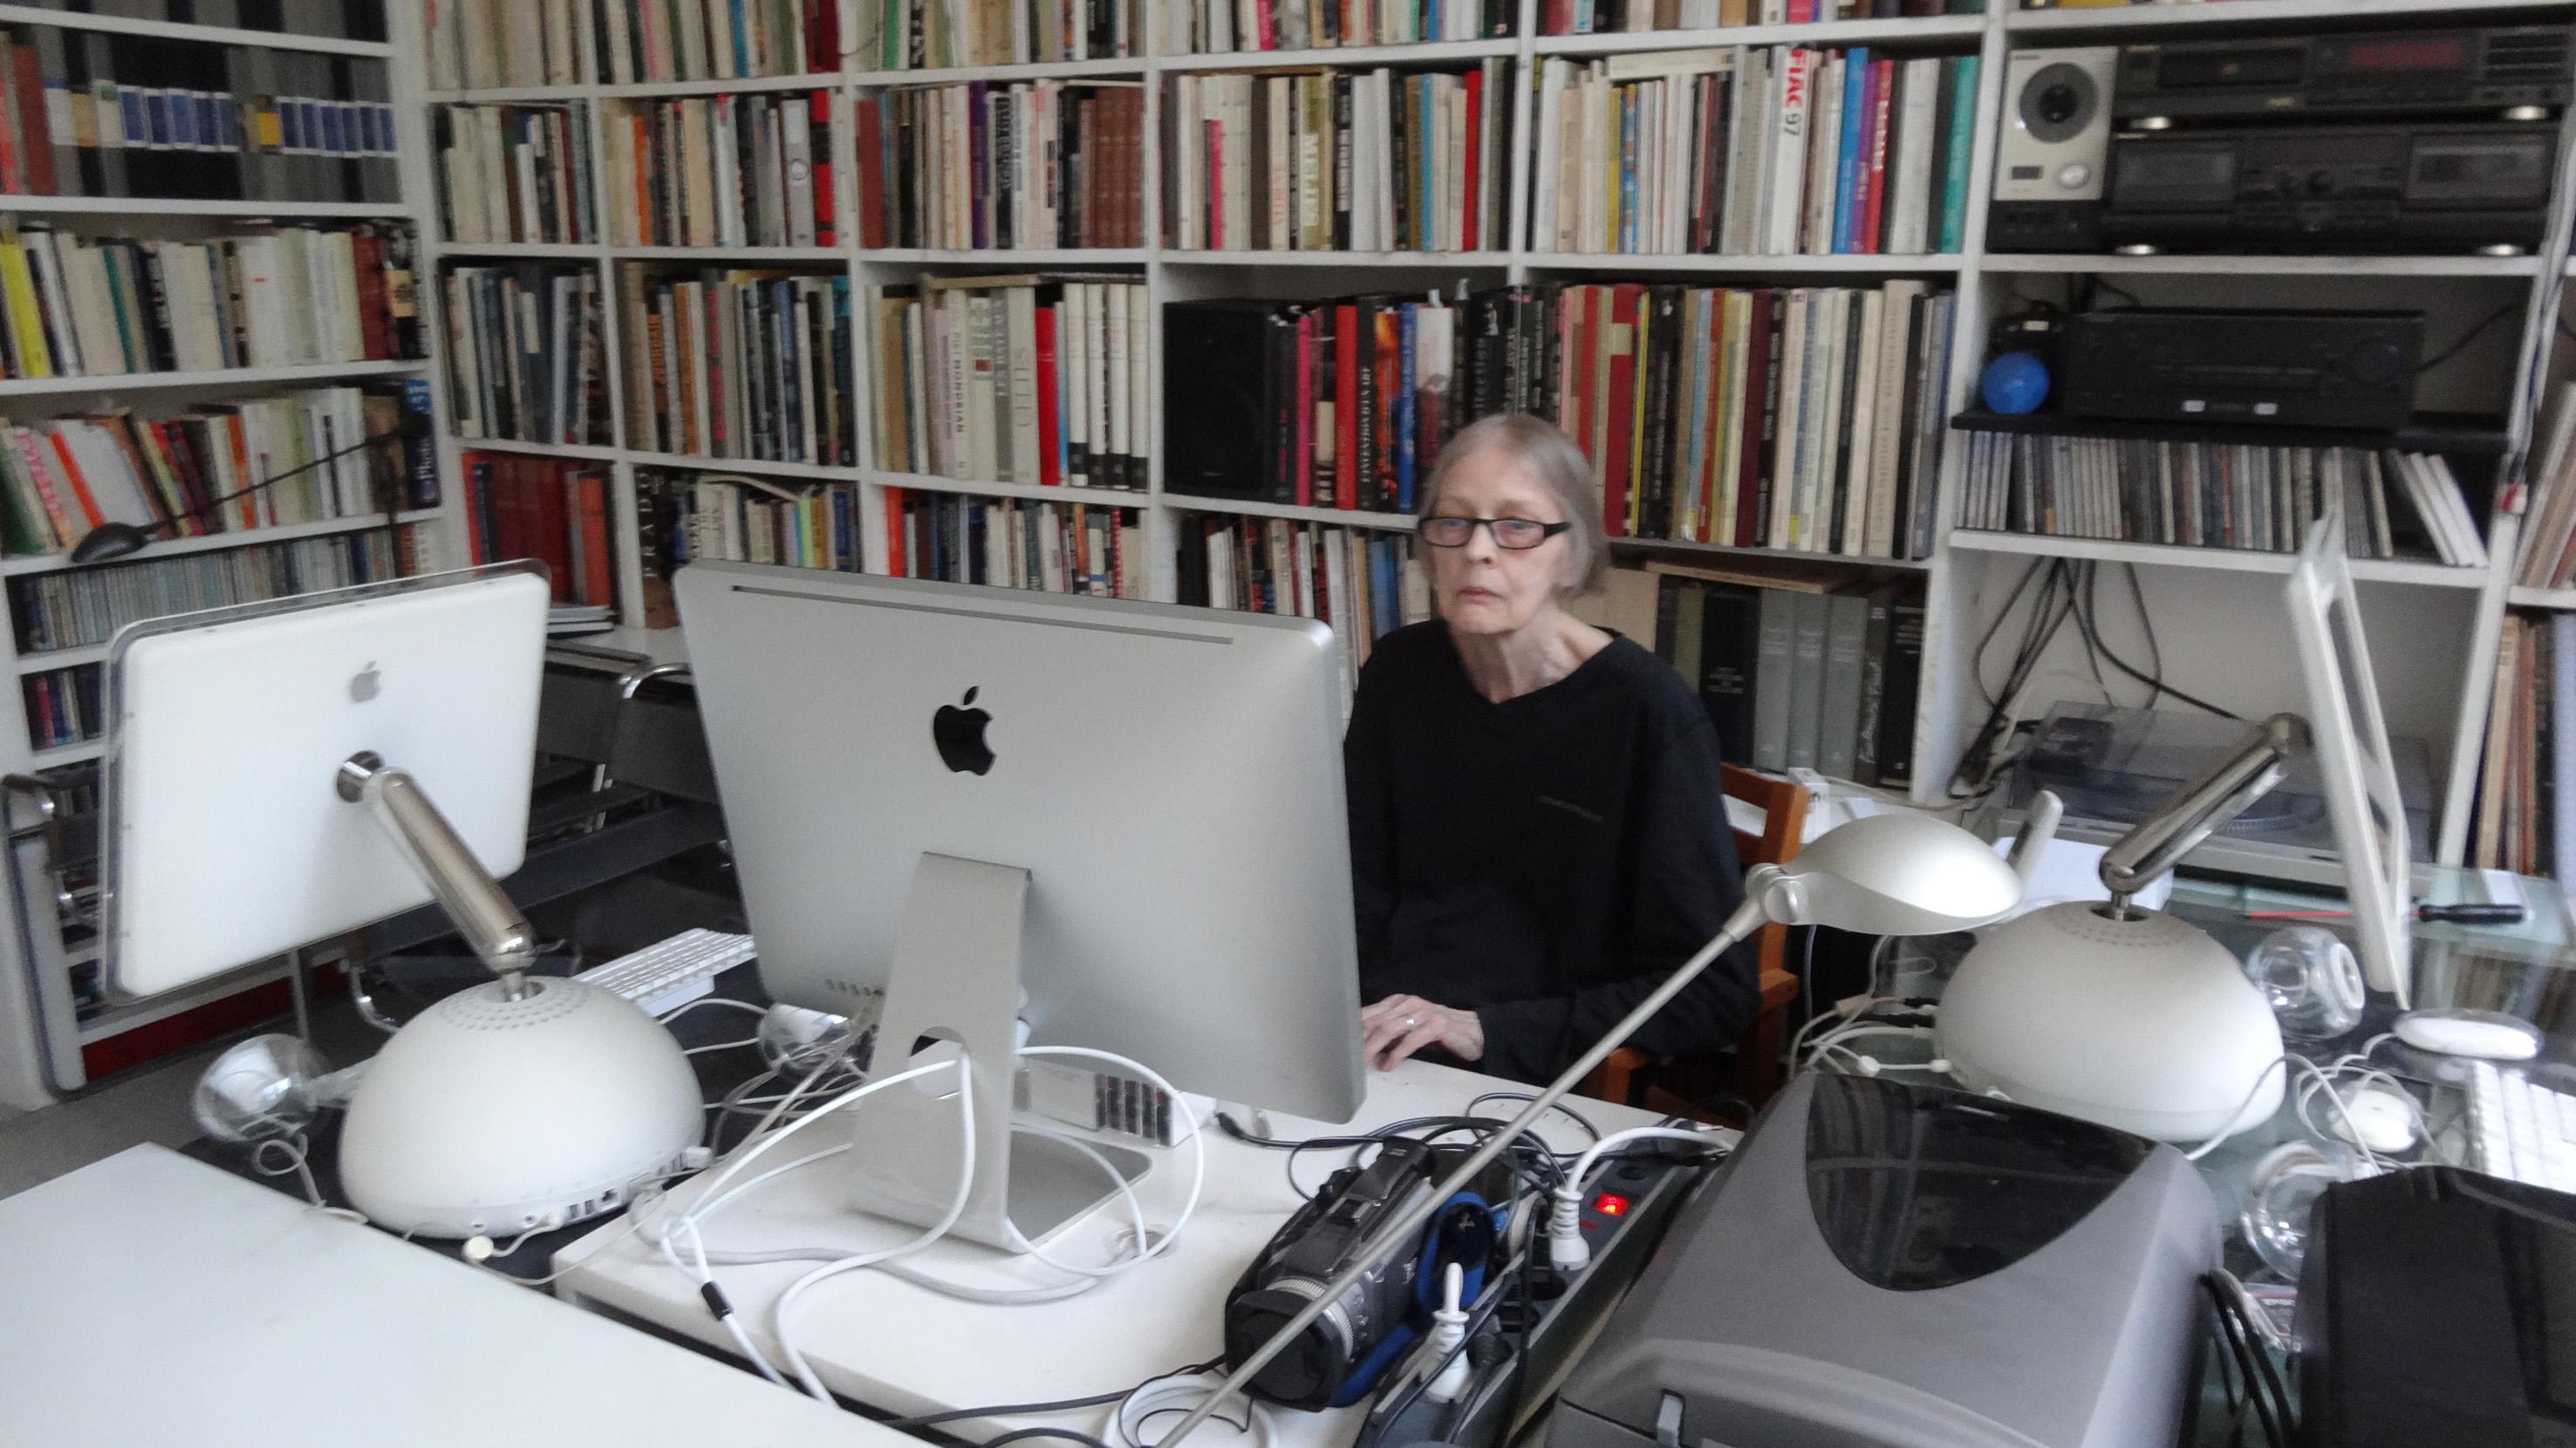 Image of Nancy Wilson-Pajic from Wikidata